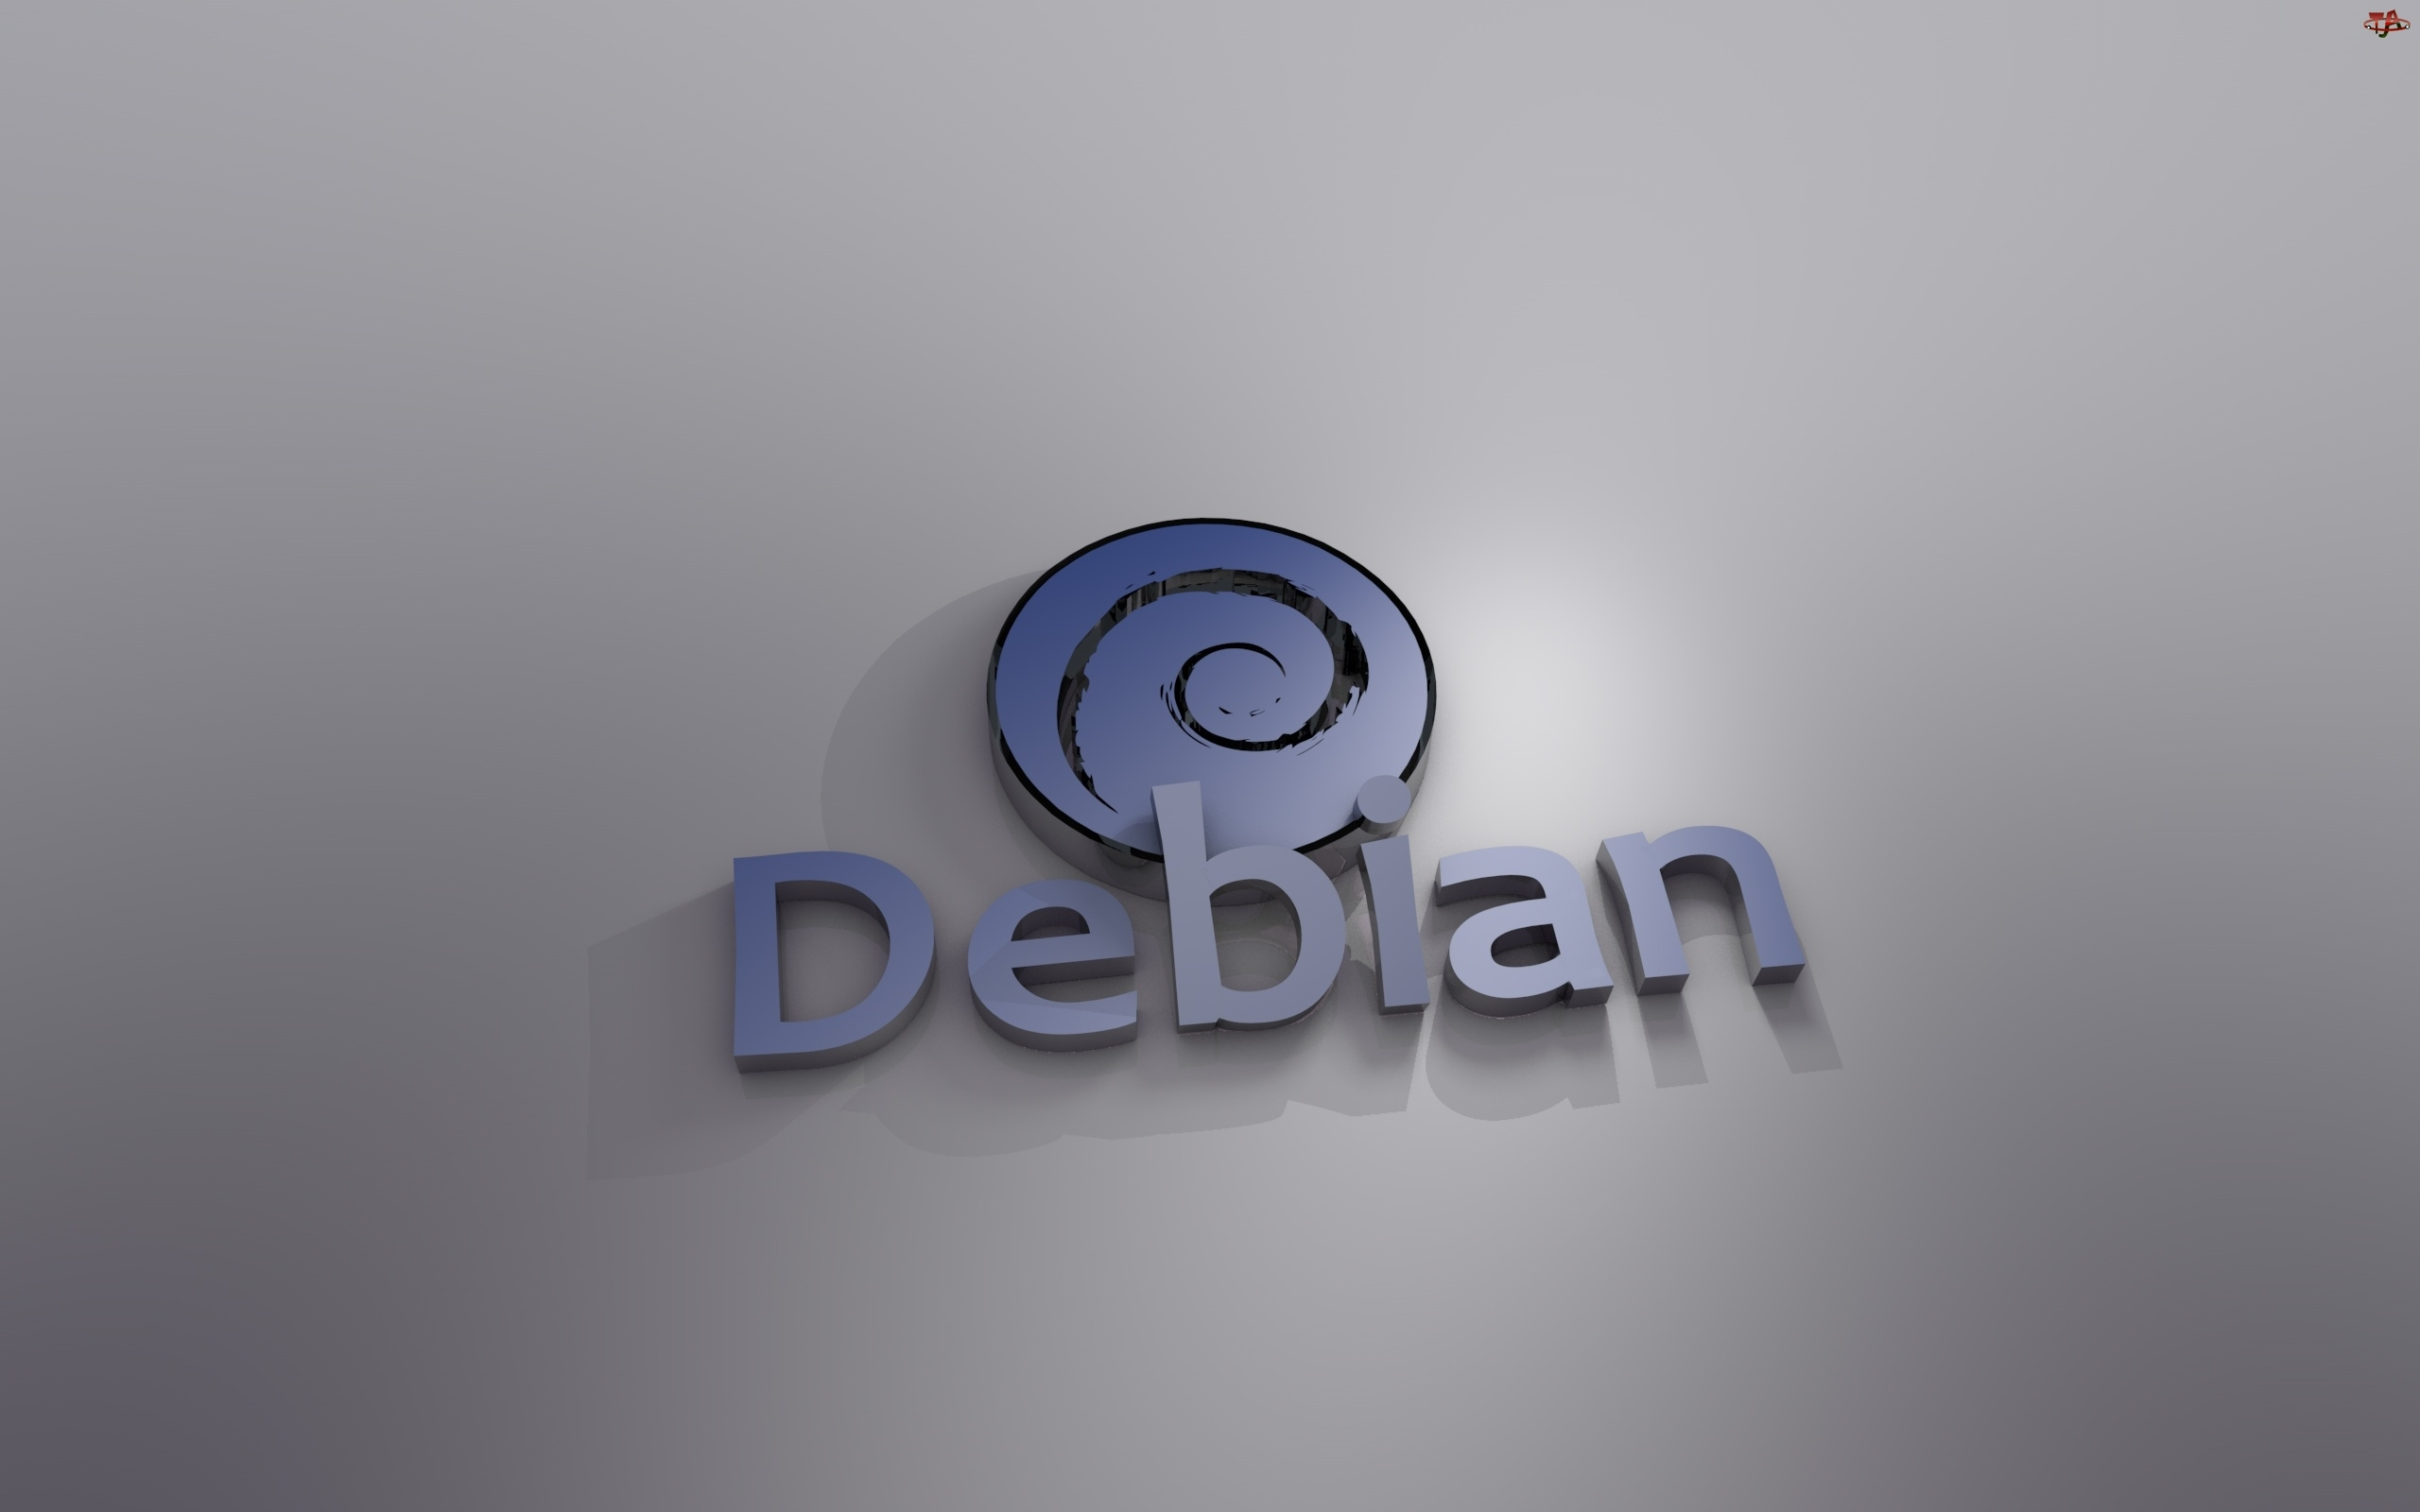 Tektury, Debian, Spirala